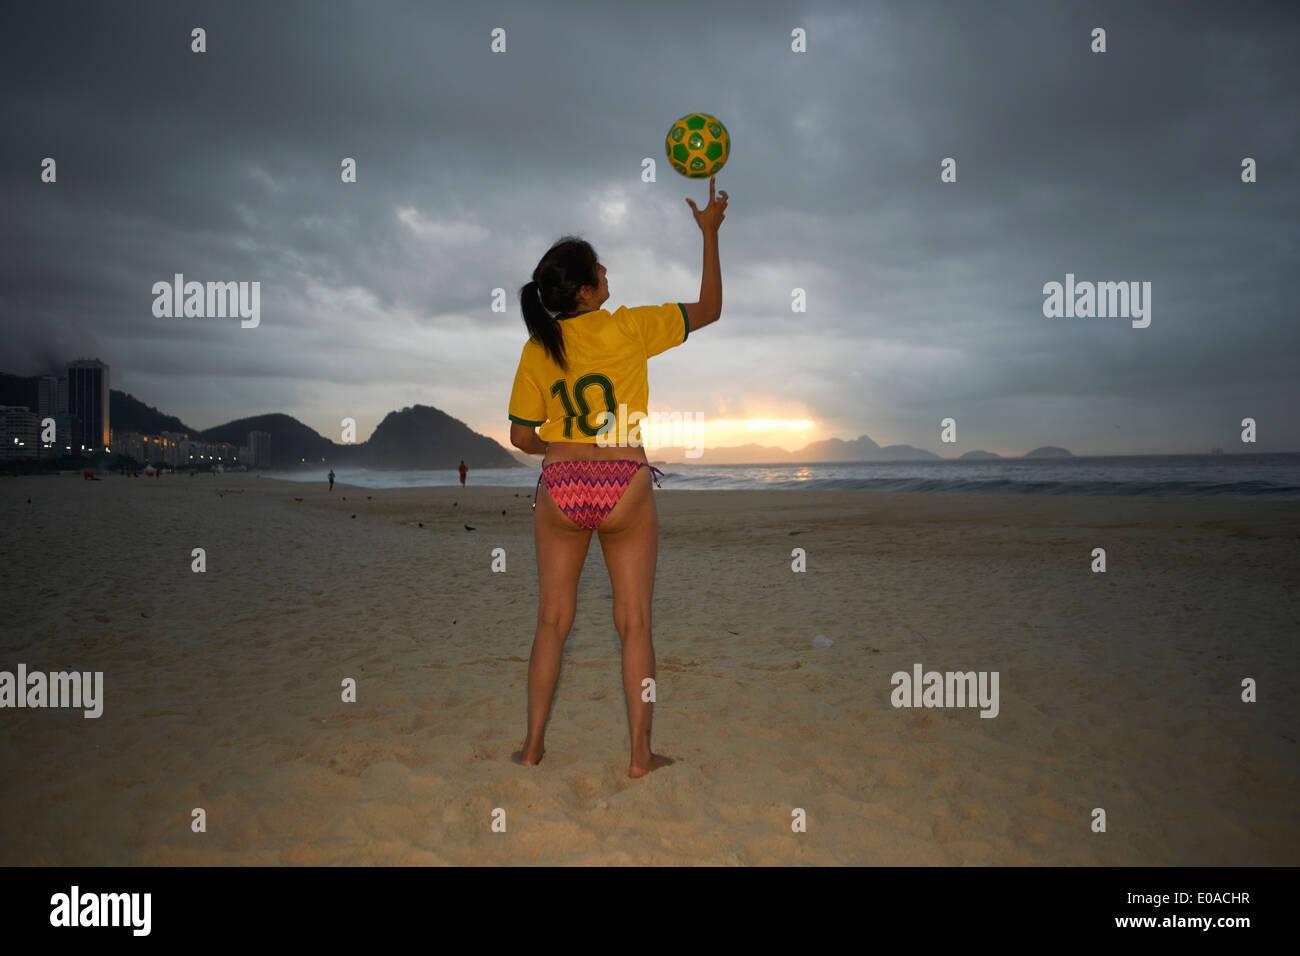 Mature woman balancing soccer ball on finger, Copacabana beach, Rio De Janeiro, Brazil - Stock Image